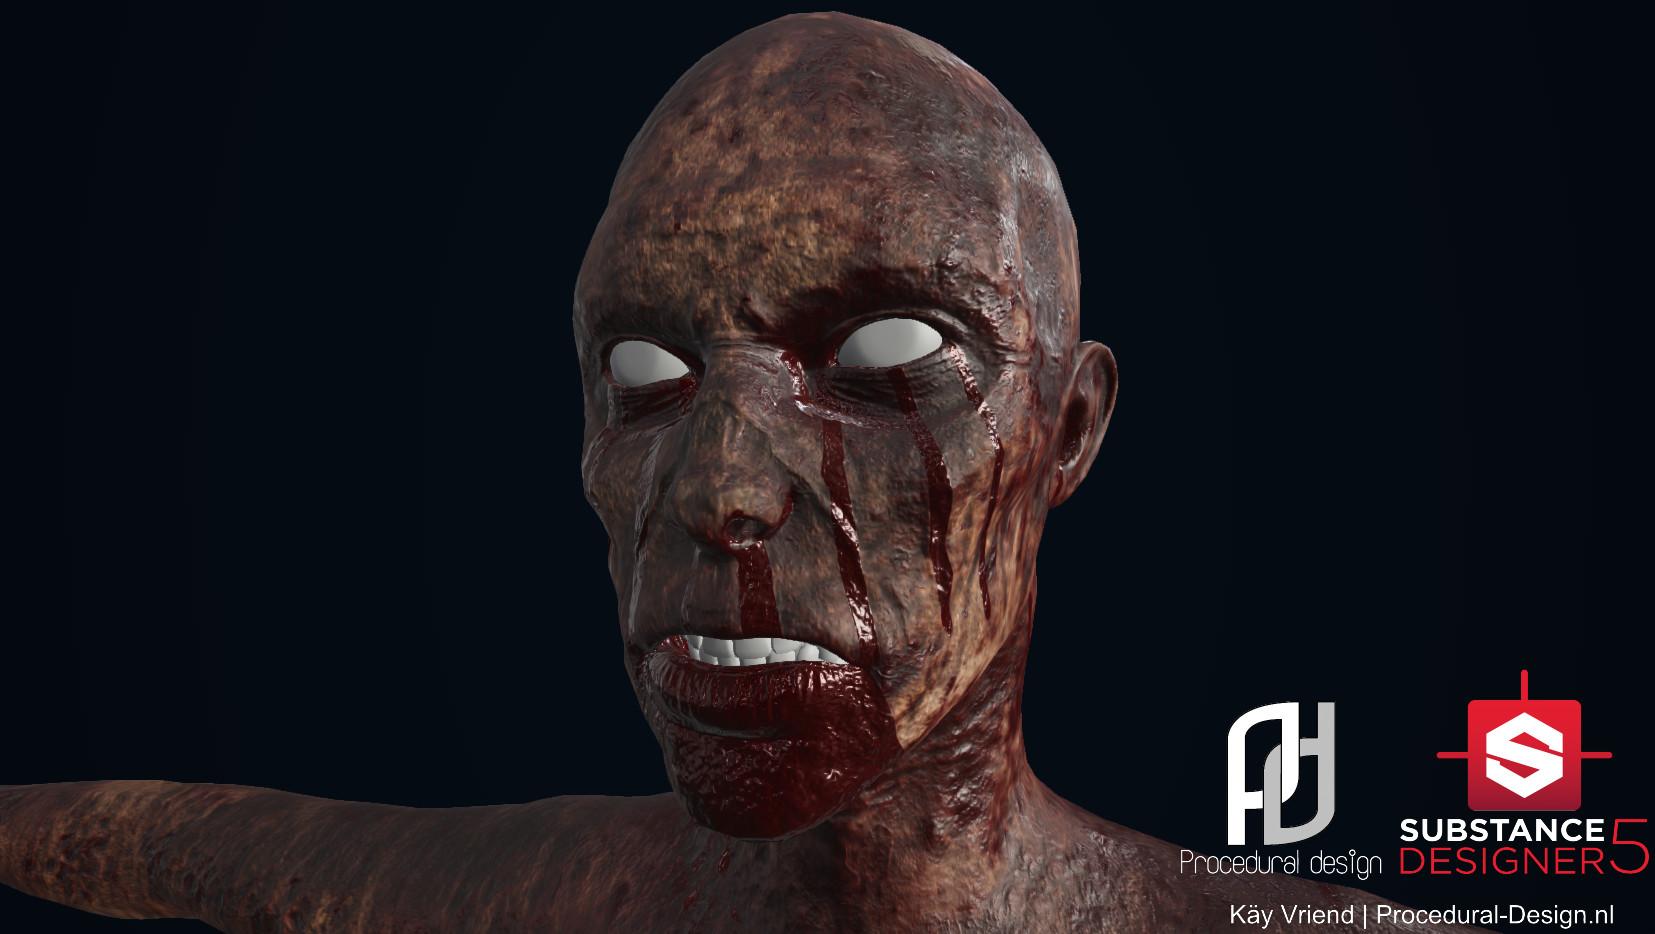 Kay vriend zombie 20